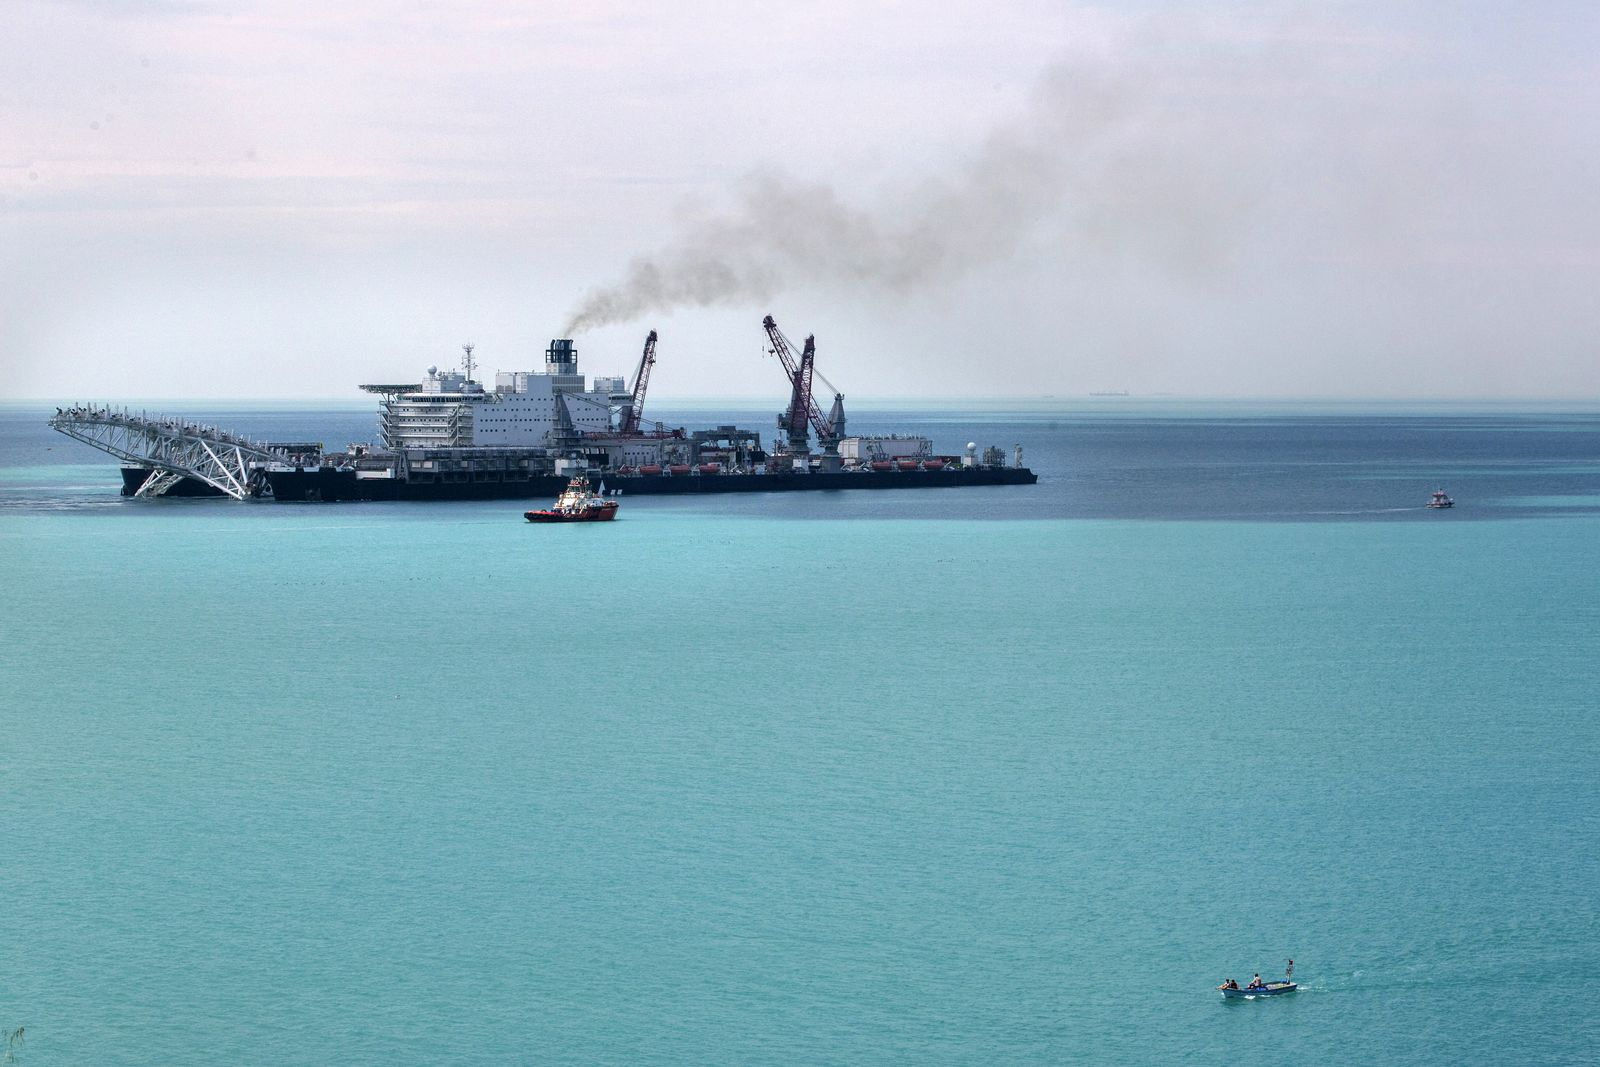 TURKEY-RUSSIA-TRANSPORT-CONSTRUCTION-OIL